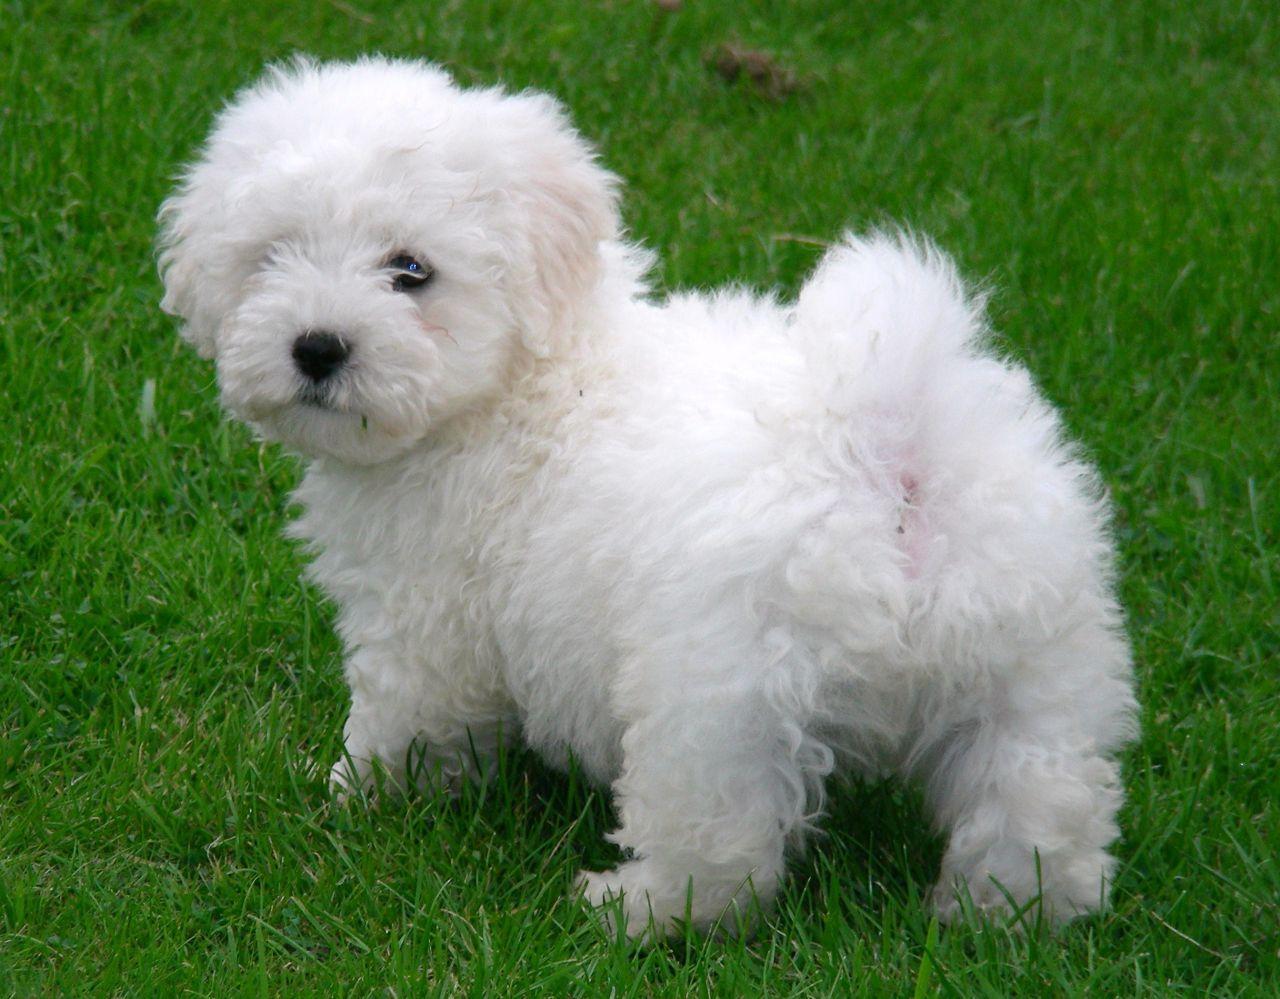 BEAUTIFUL BICHON PUPPIES Puppies, Beautiful dog breeds